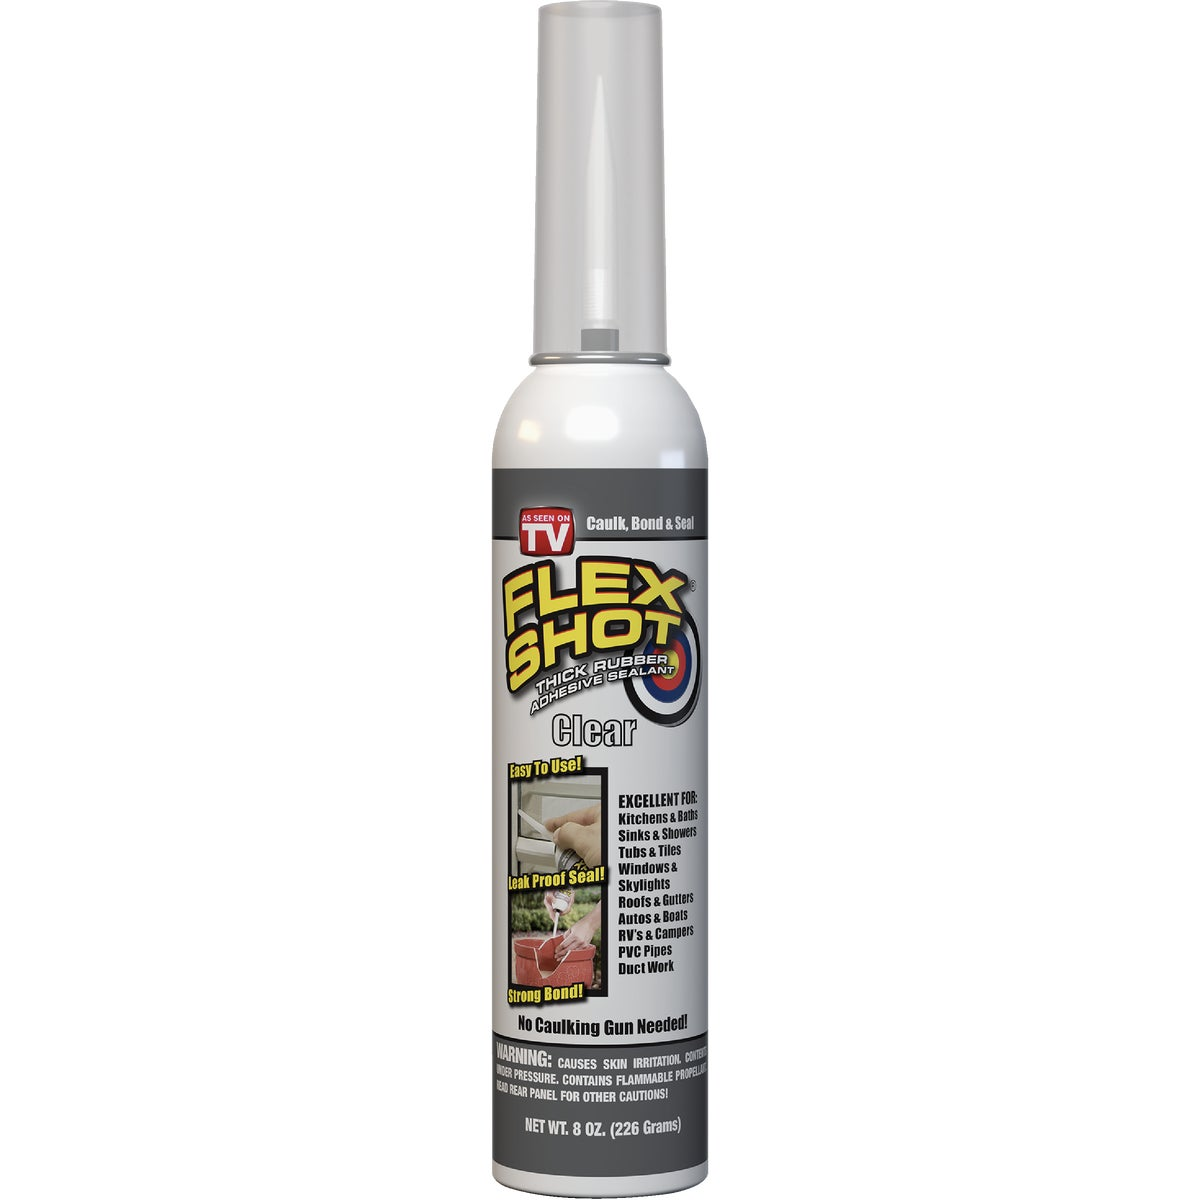 Flex Shot Adhesive Rubber Sealant